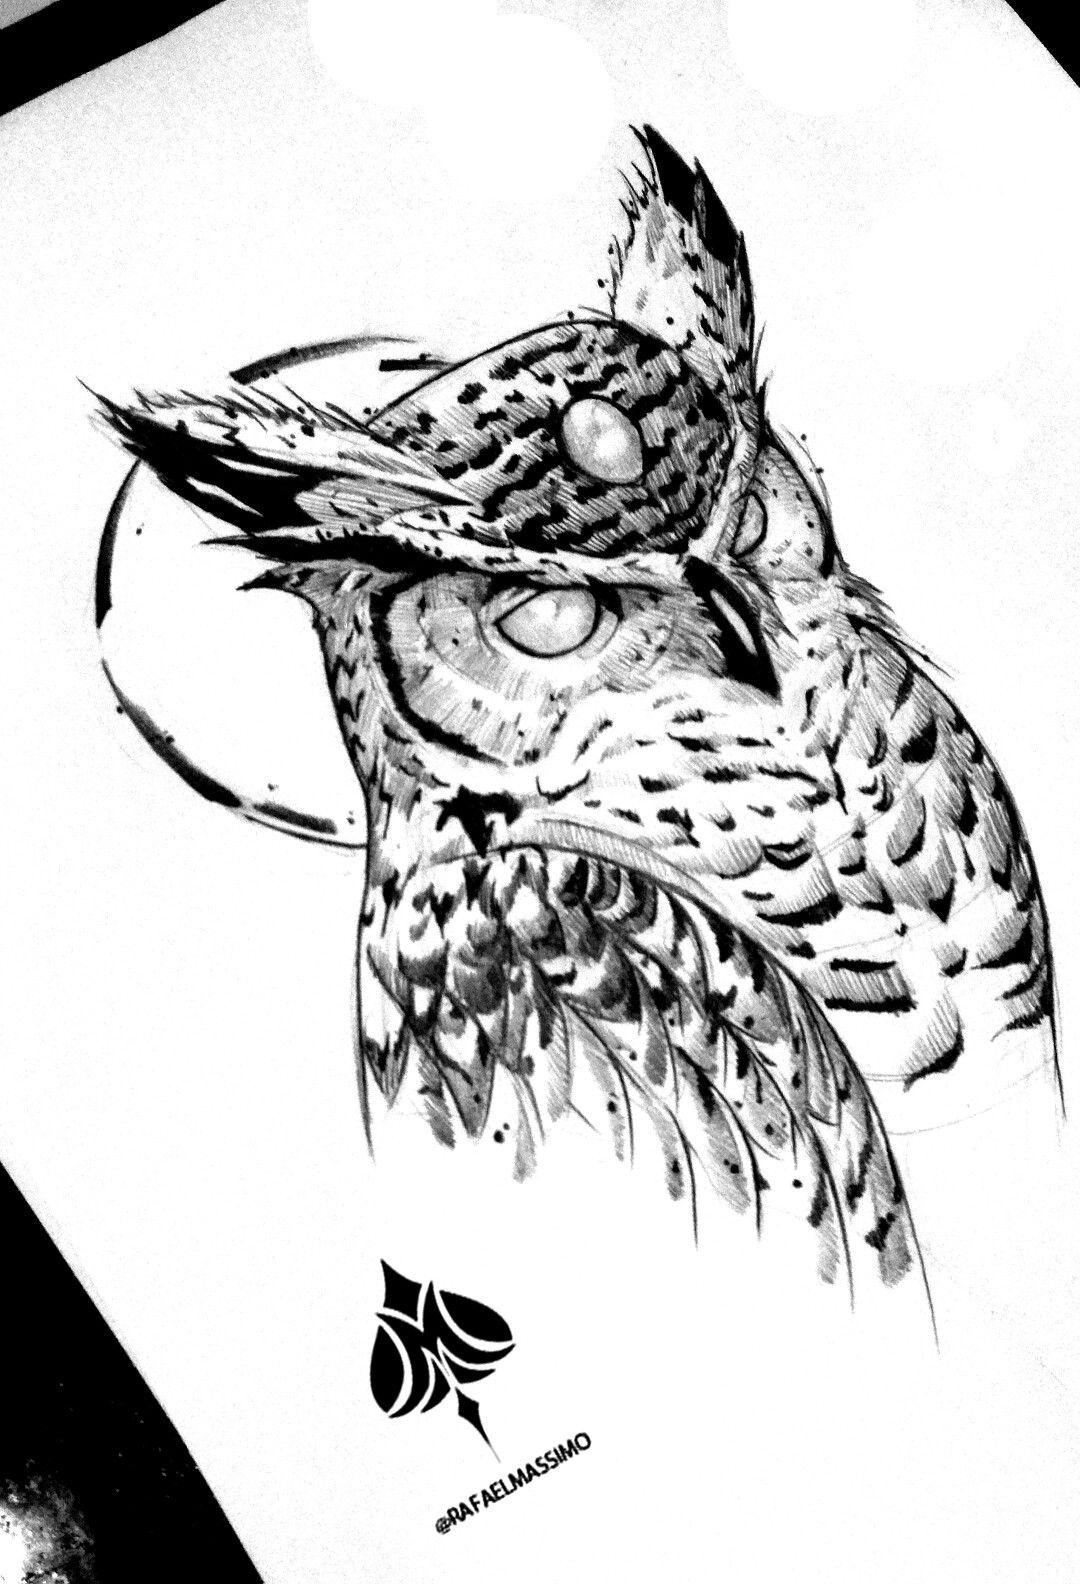 Sketchwork Owl By Rafaelmassimo Owl Blackwork Sketchwork